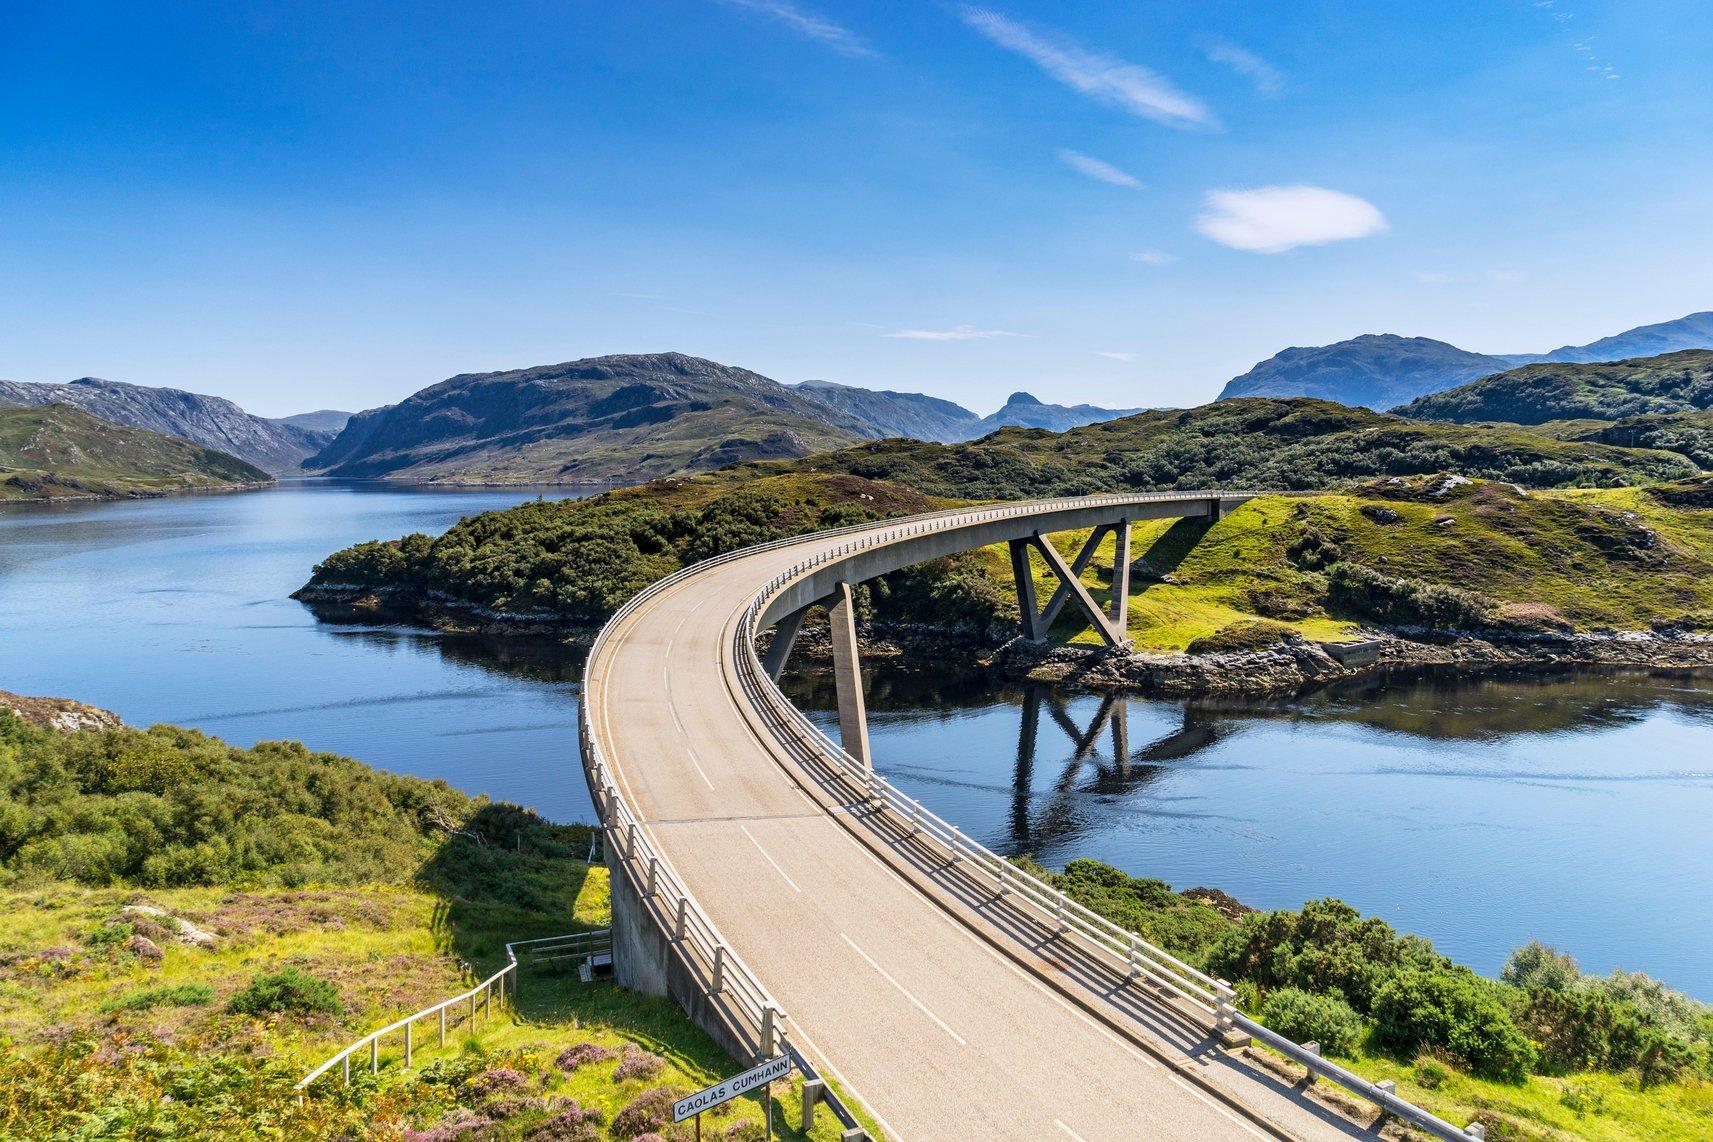 Scenic Drives UK - NC500 West Coast stretch